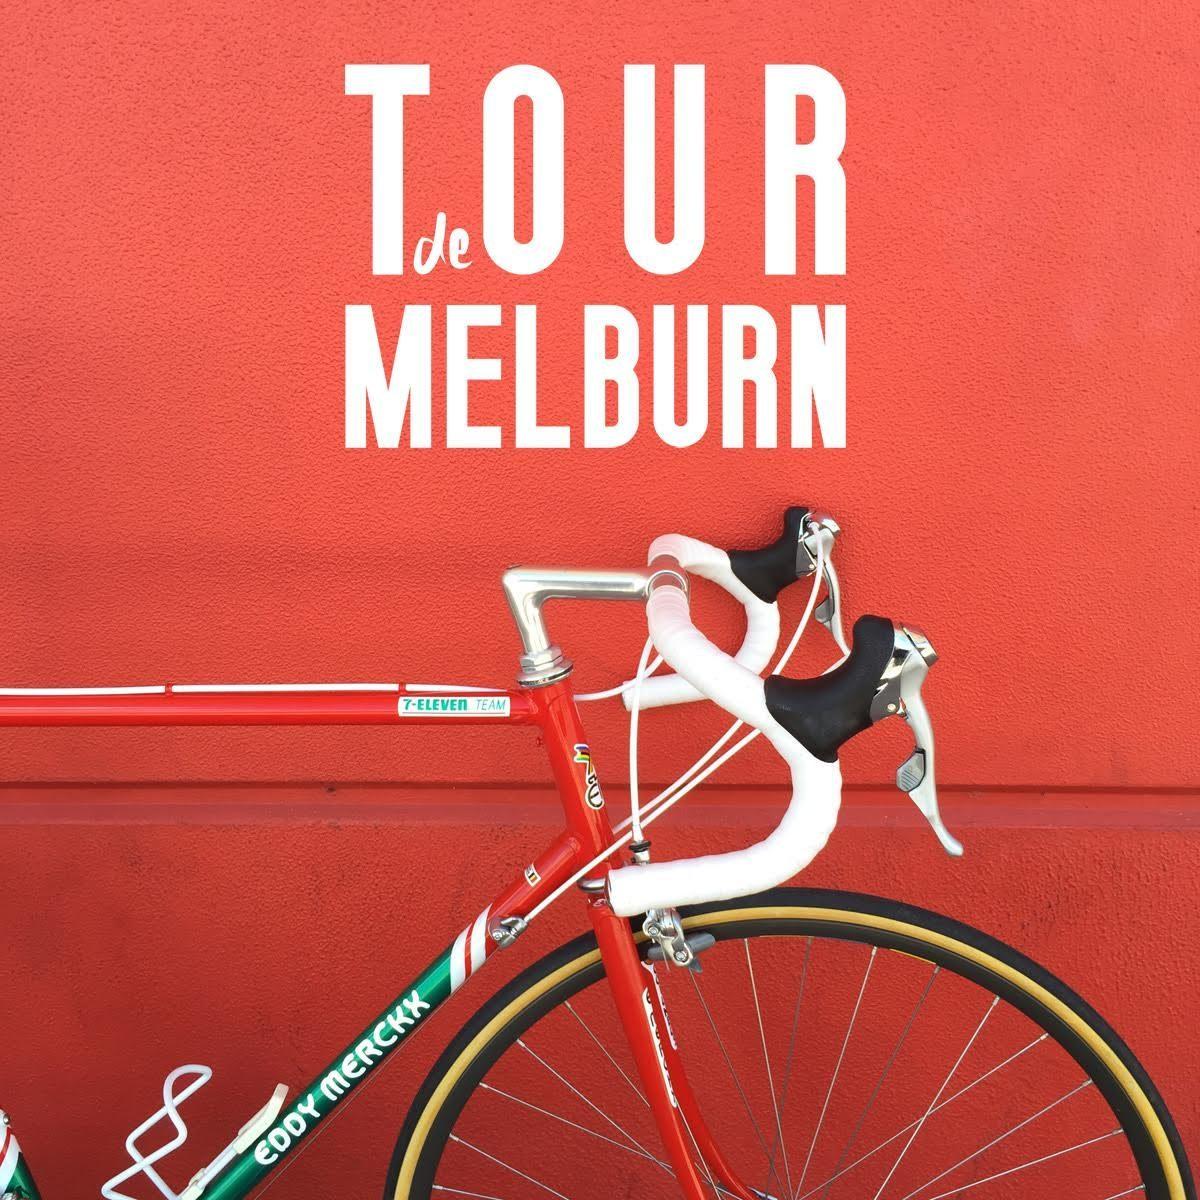 TourDeMelburn